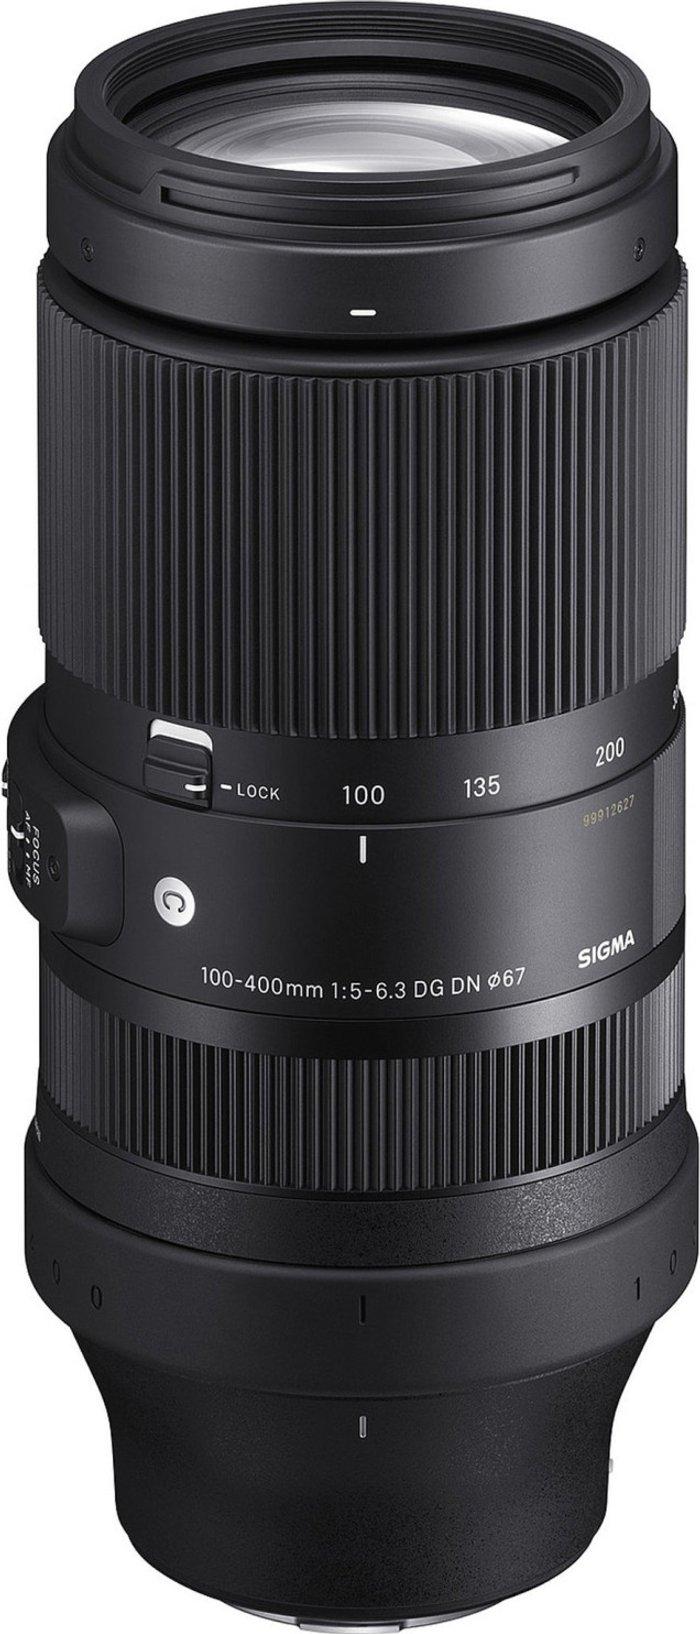 Sigma Sigma 100-400mm f5-6.3 DG DN OS Contemporary Leica L